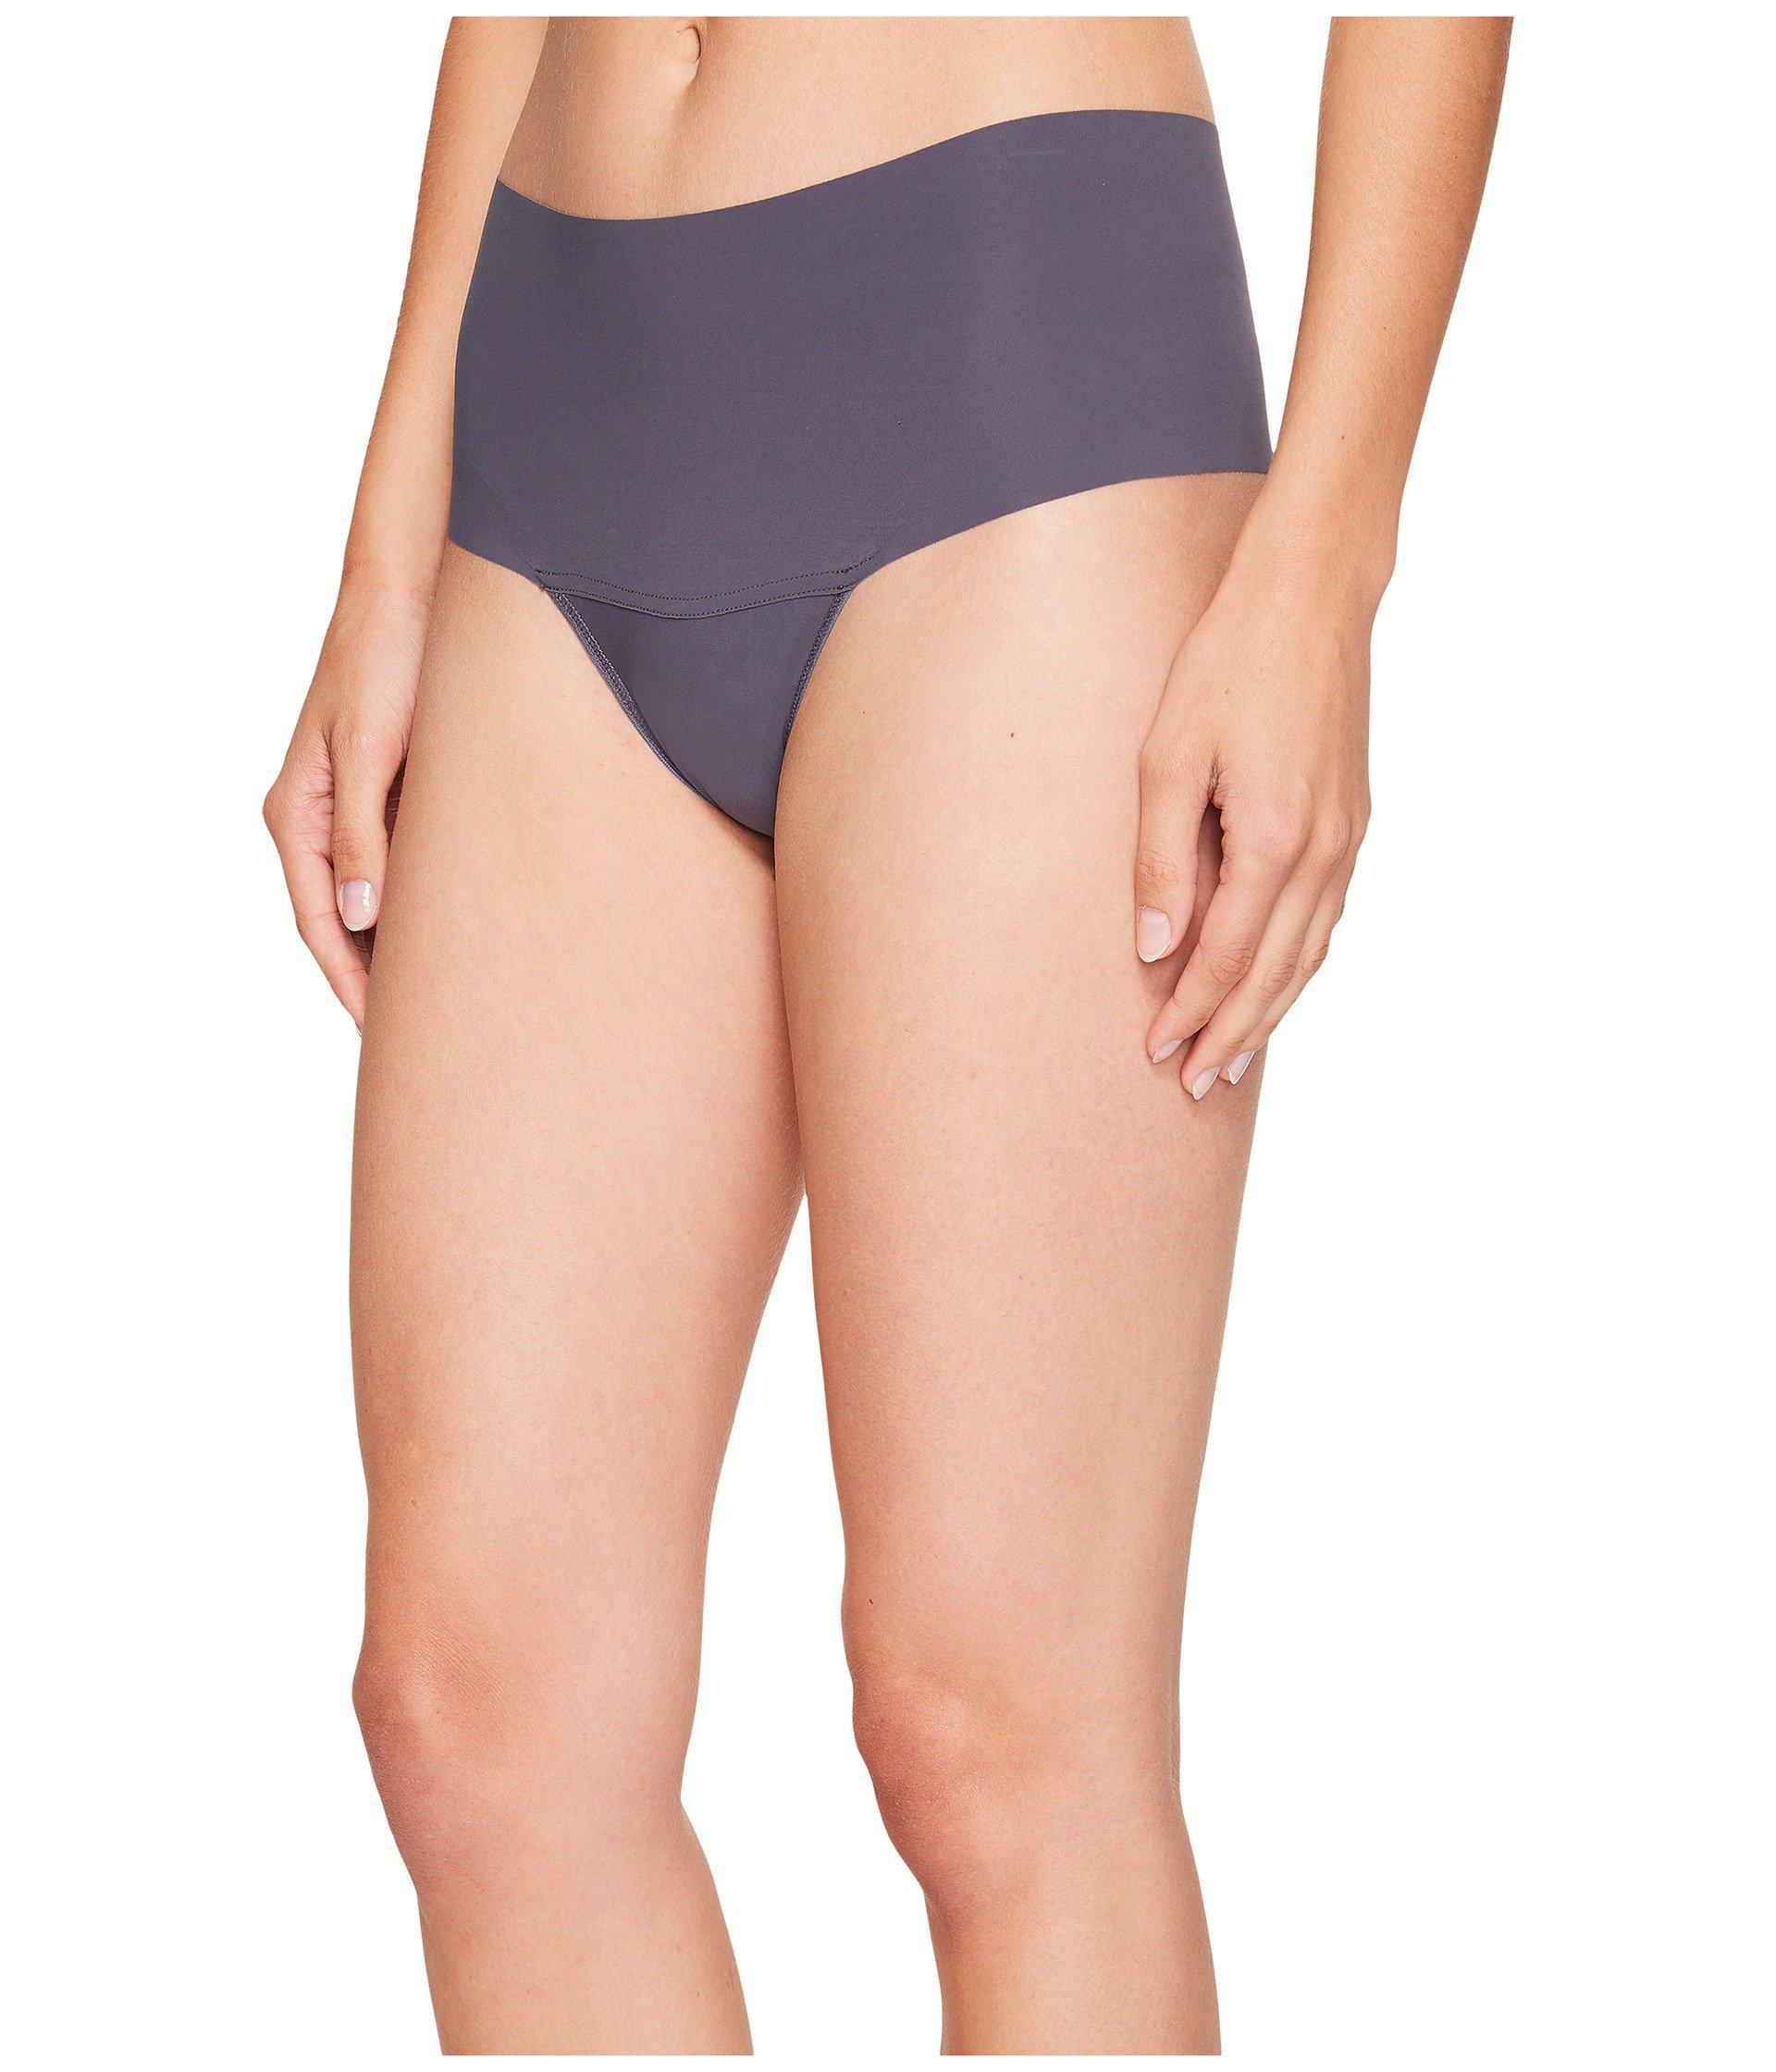 40552053522 Lyst - Hanky Panky Bare(r) Godiva Hi-rise Thong (black) Women s Underwear  in Gray